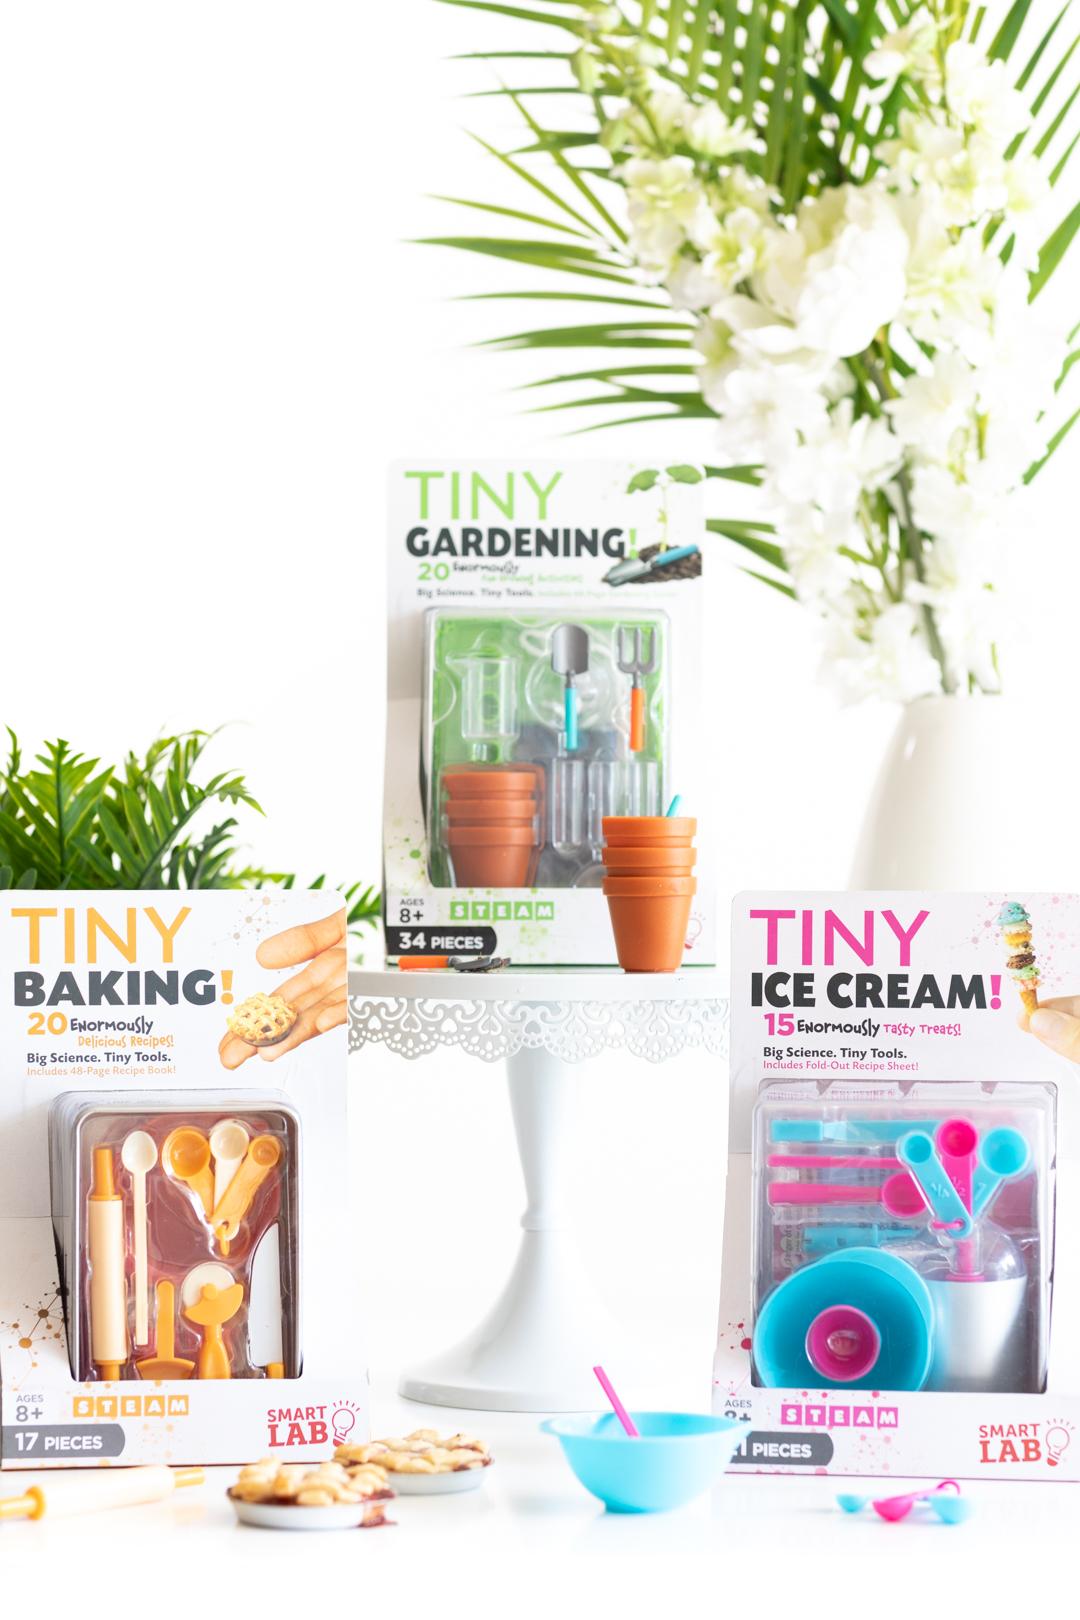 Tiny Gardening Kit, Tiny Baking Kit, Tiny Ice Cream Kit packages